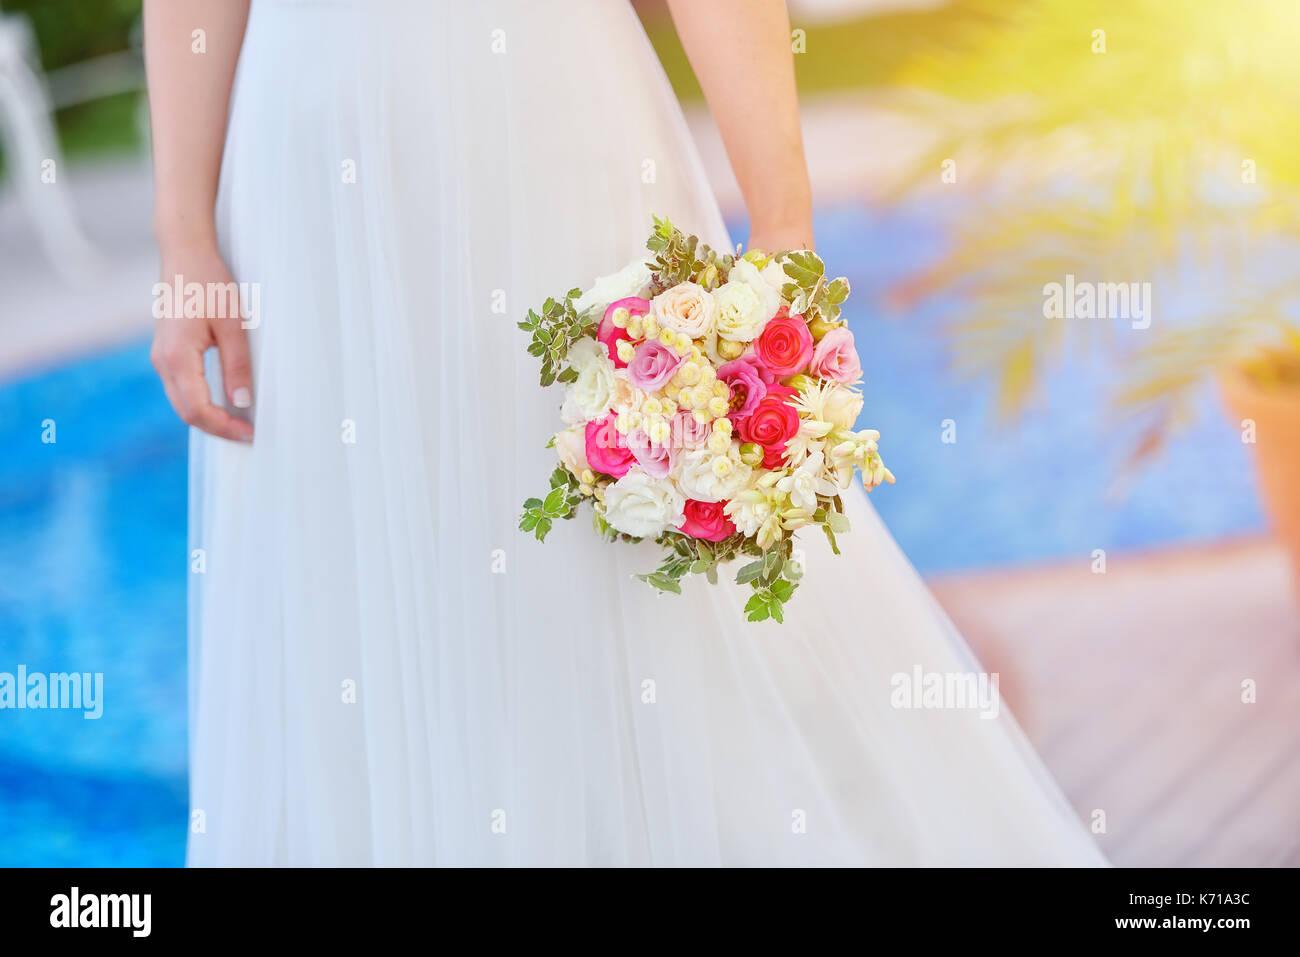 Fatal Love Stockfotos & Fatal Love Bilder - Alamy